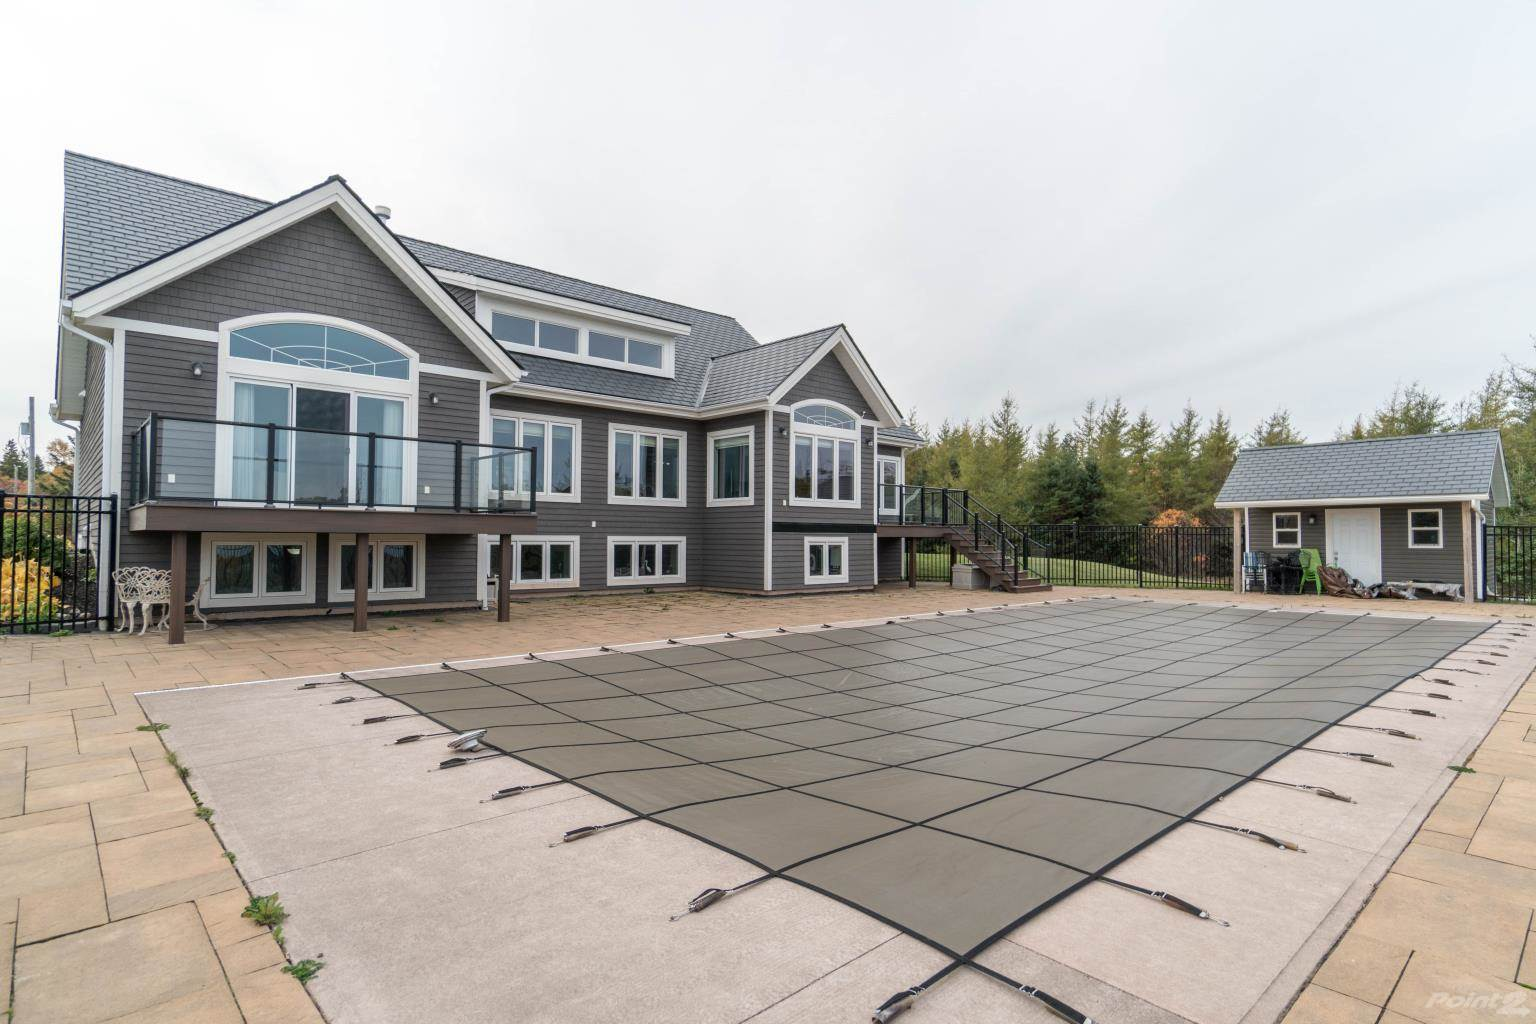 Donaldston Rd in Donaldston - House For Sale : MLS# null Photo 7